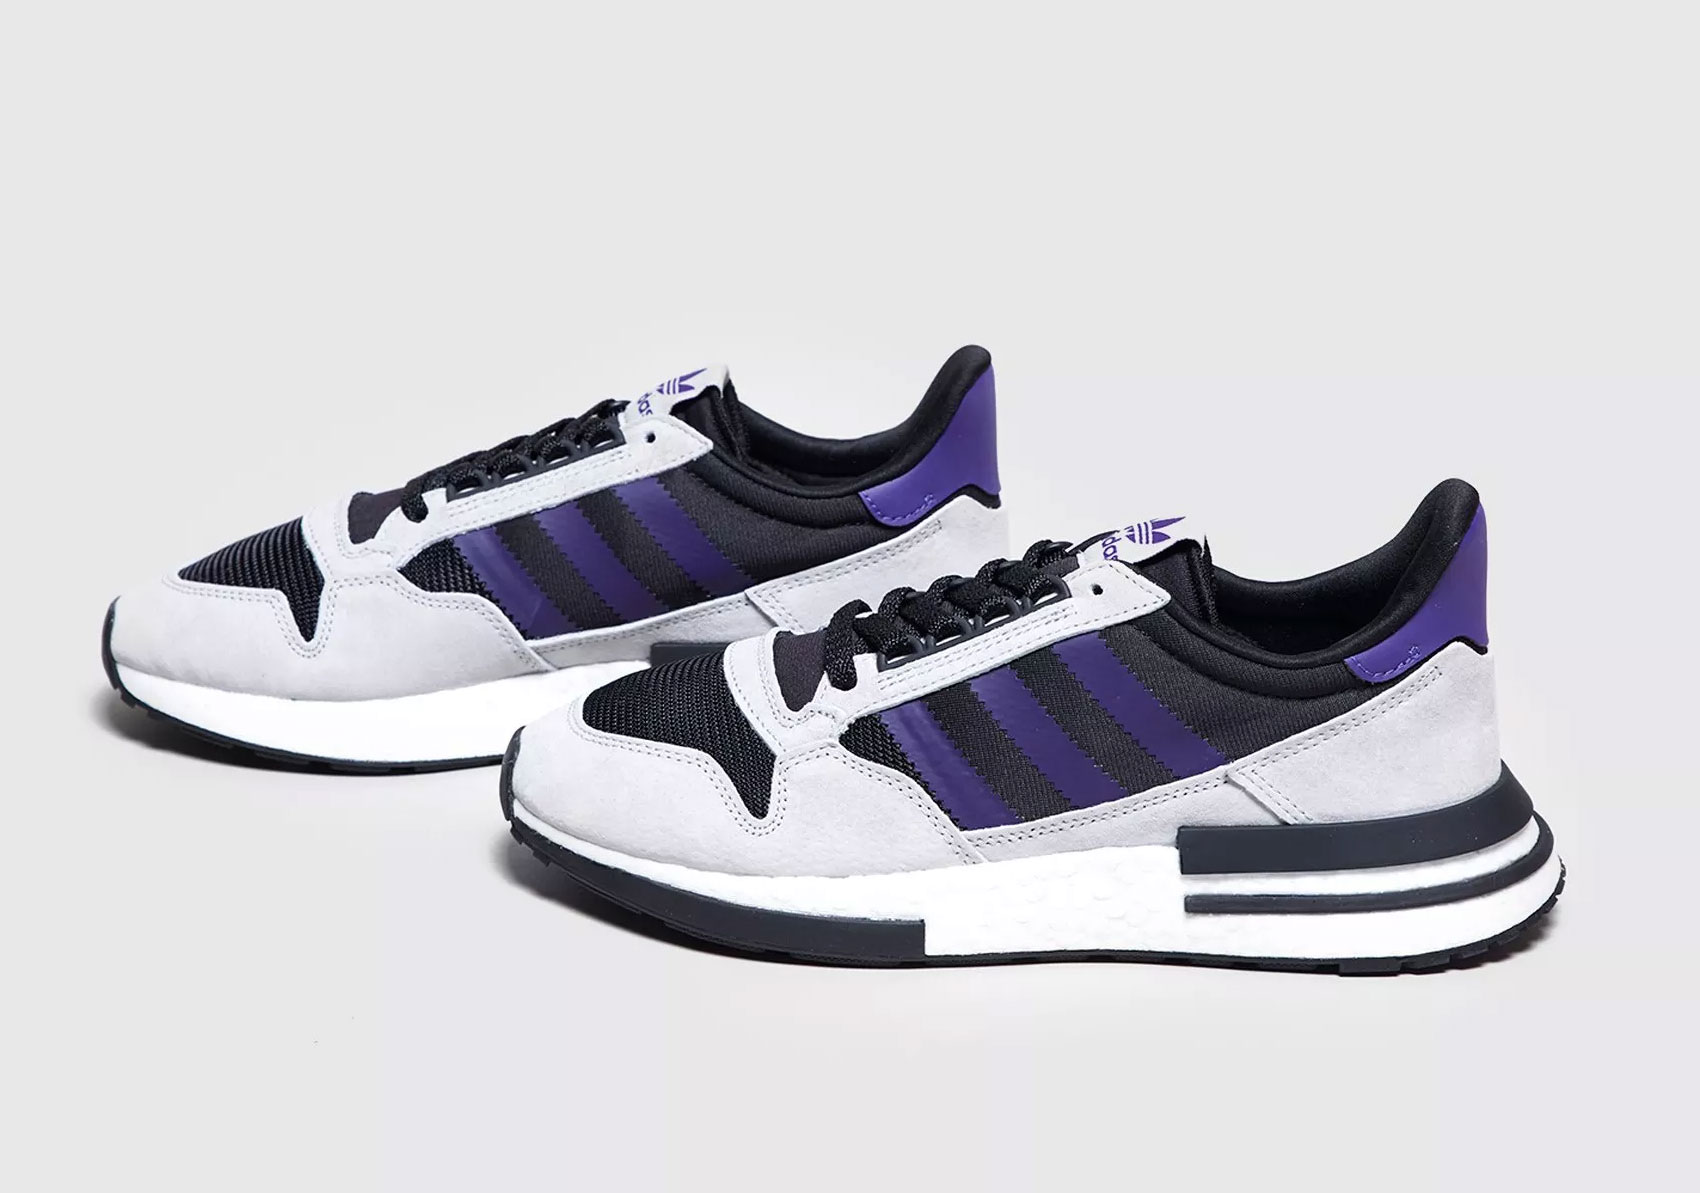 buy adidas zx 500 rm